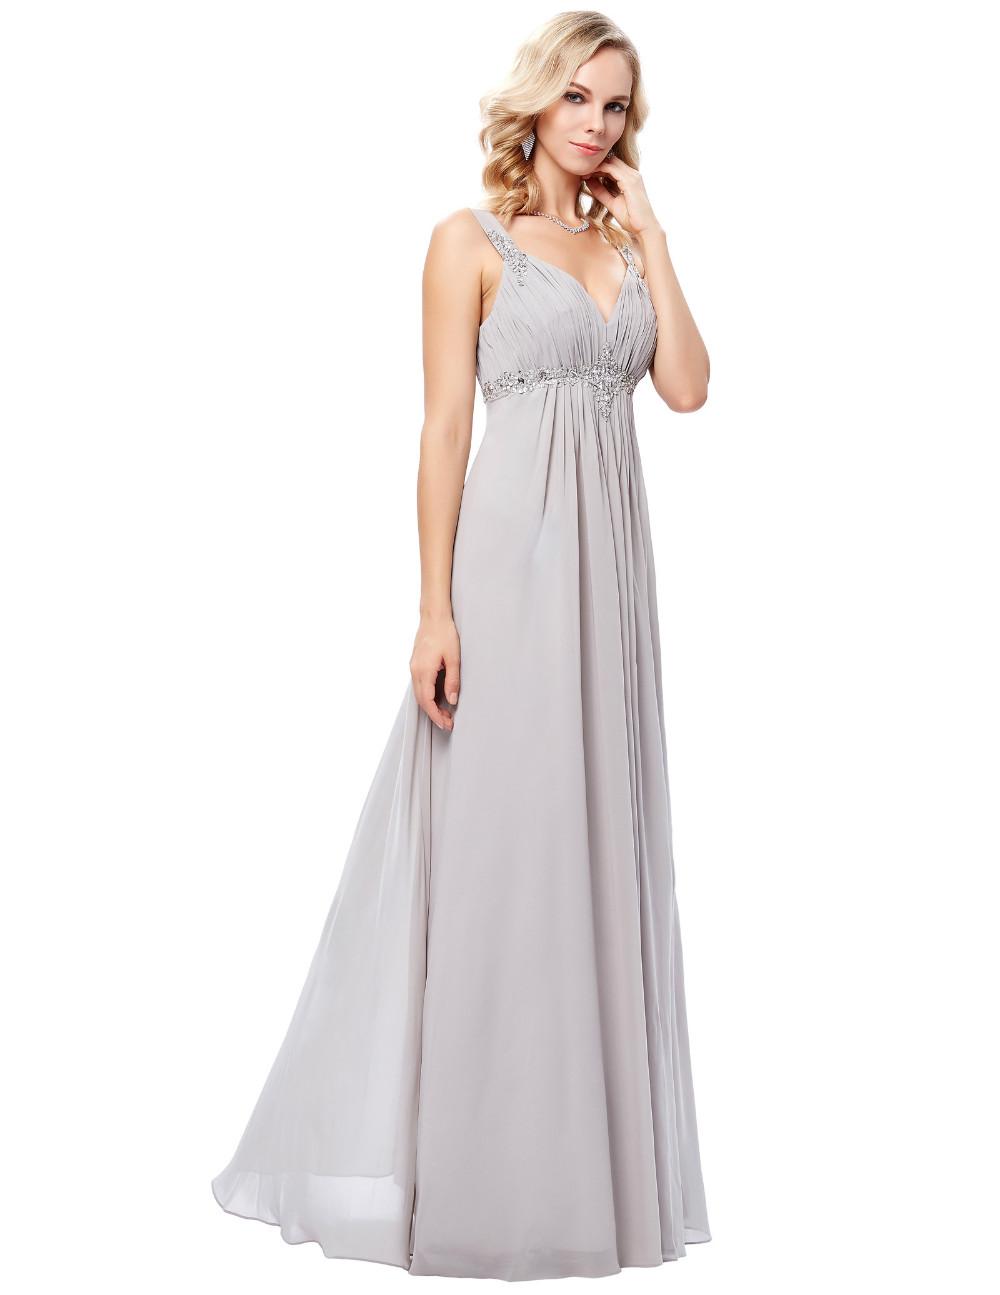 HTB1aYozOFXXXXXoXXXXq6xXFXXXaLong Formal Dress Elegant Floor Length Chiffon Dress